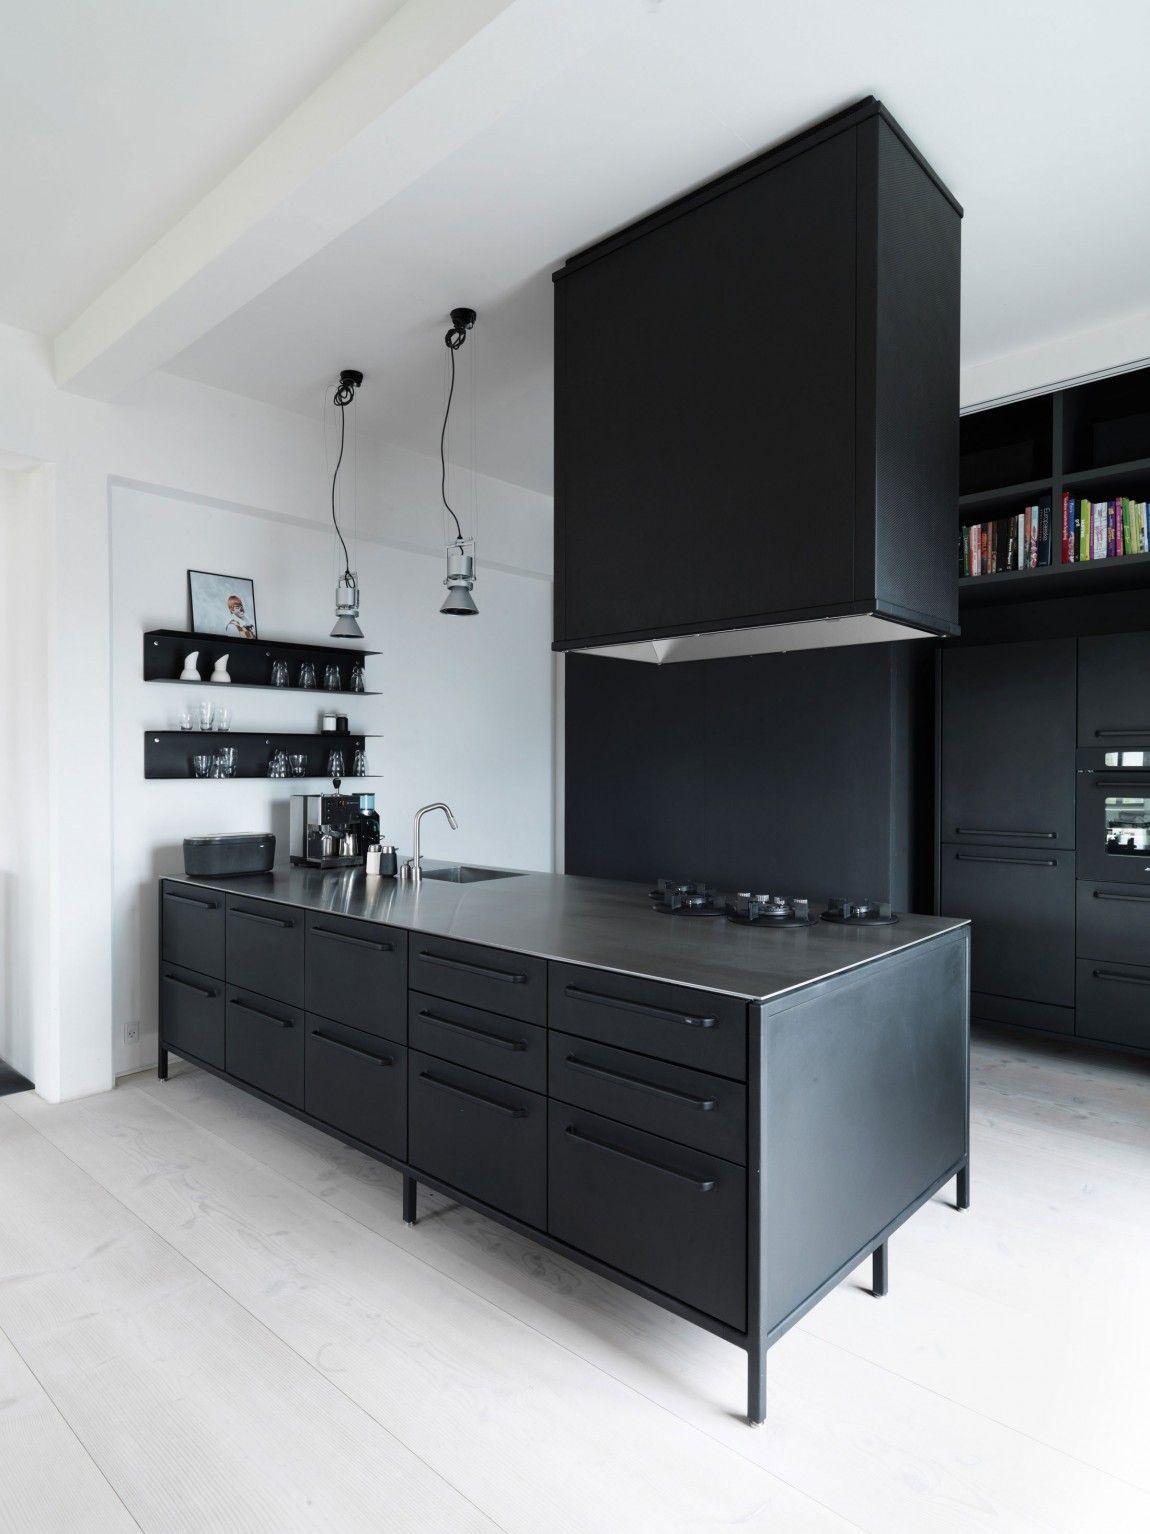 The Home of Morten Bo Jensen by Vipp